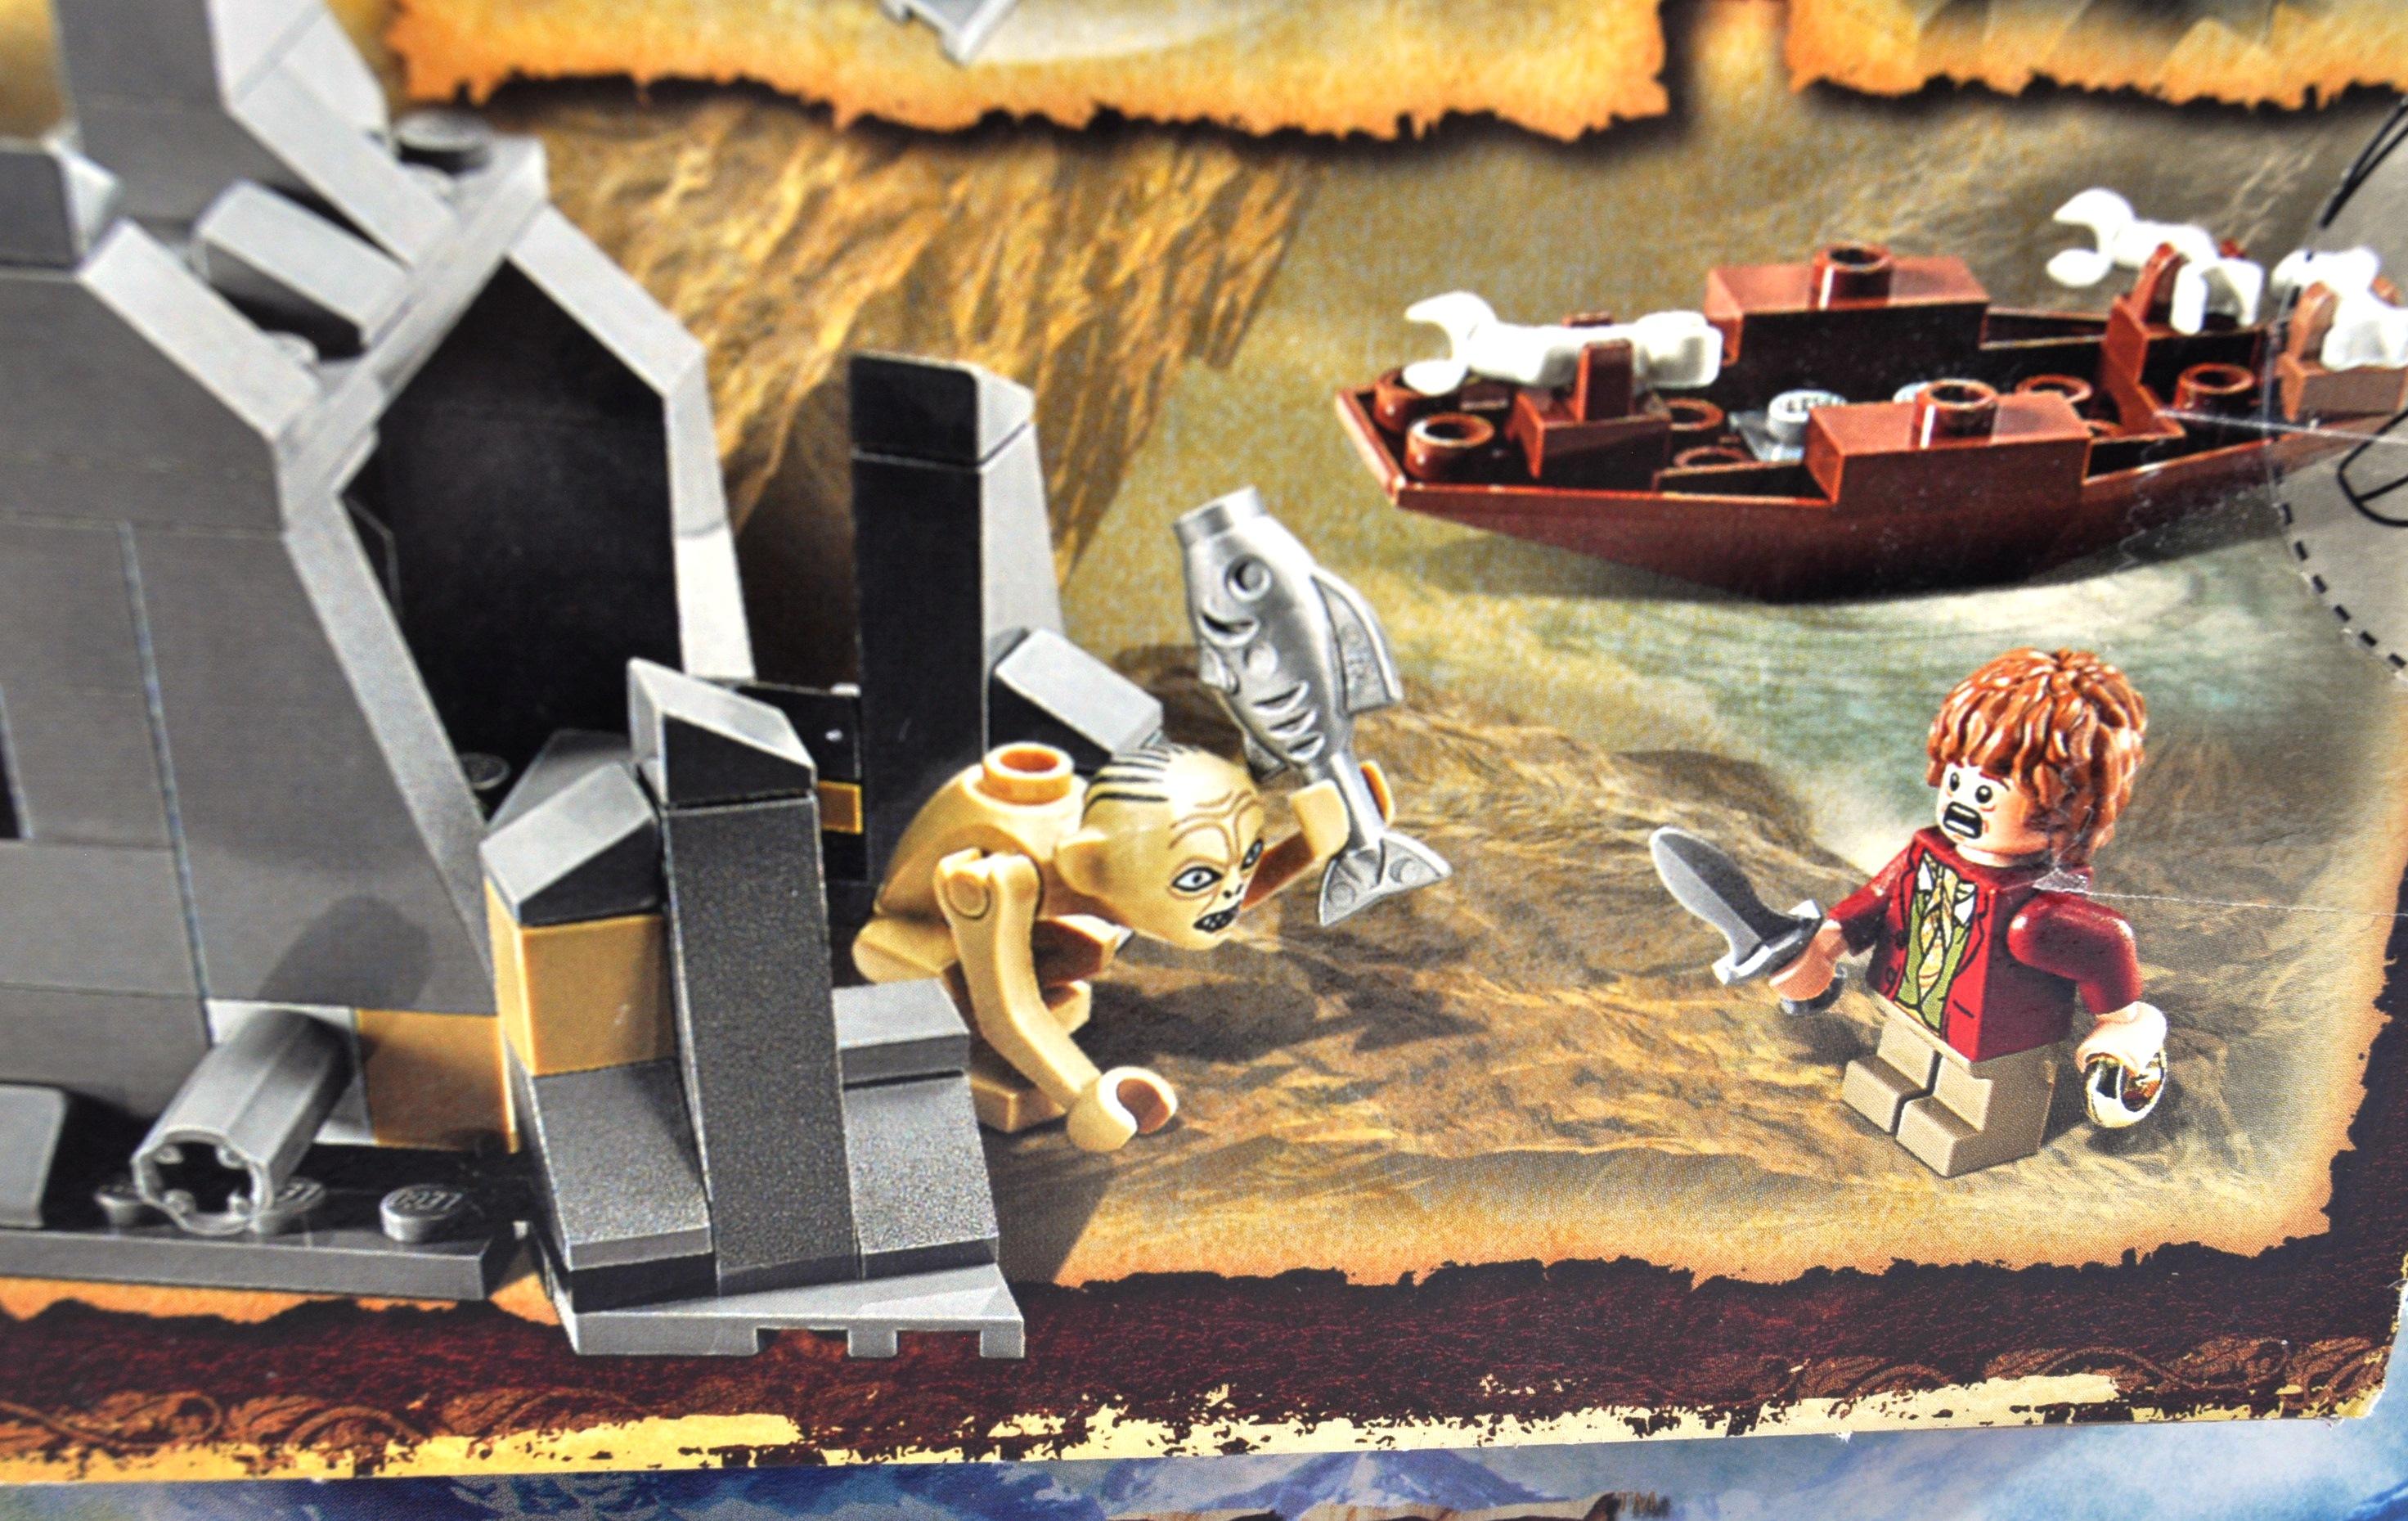 LEGO SETS - THE HOBBIT - 79000 / 79011 - Image 5 of 7